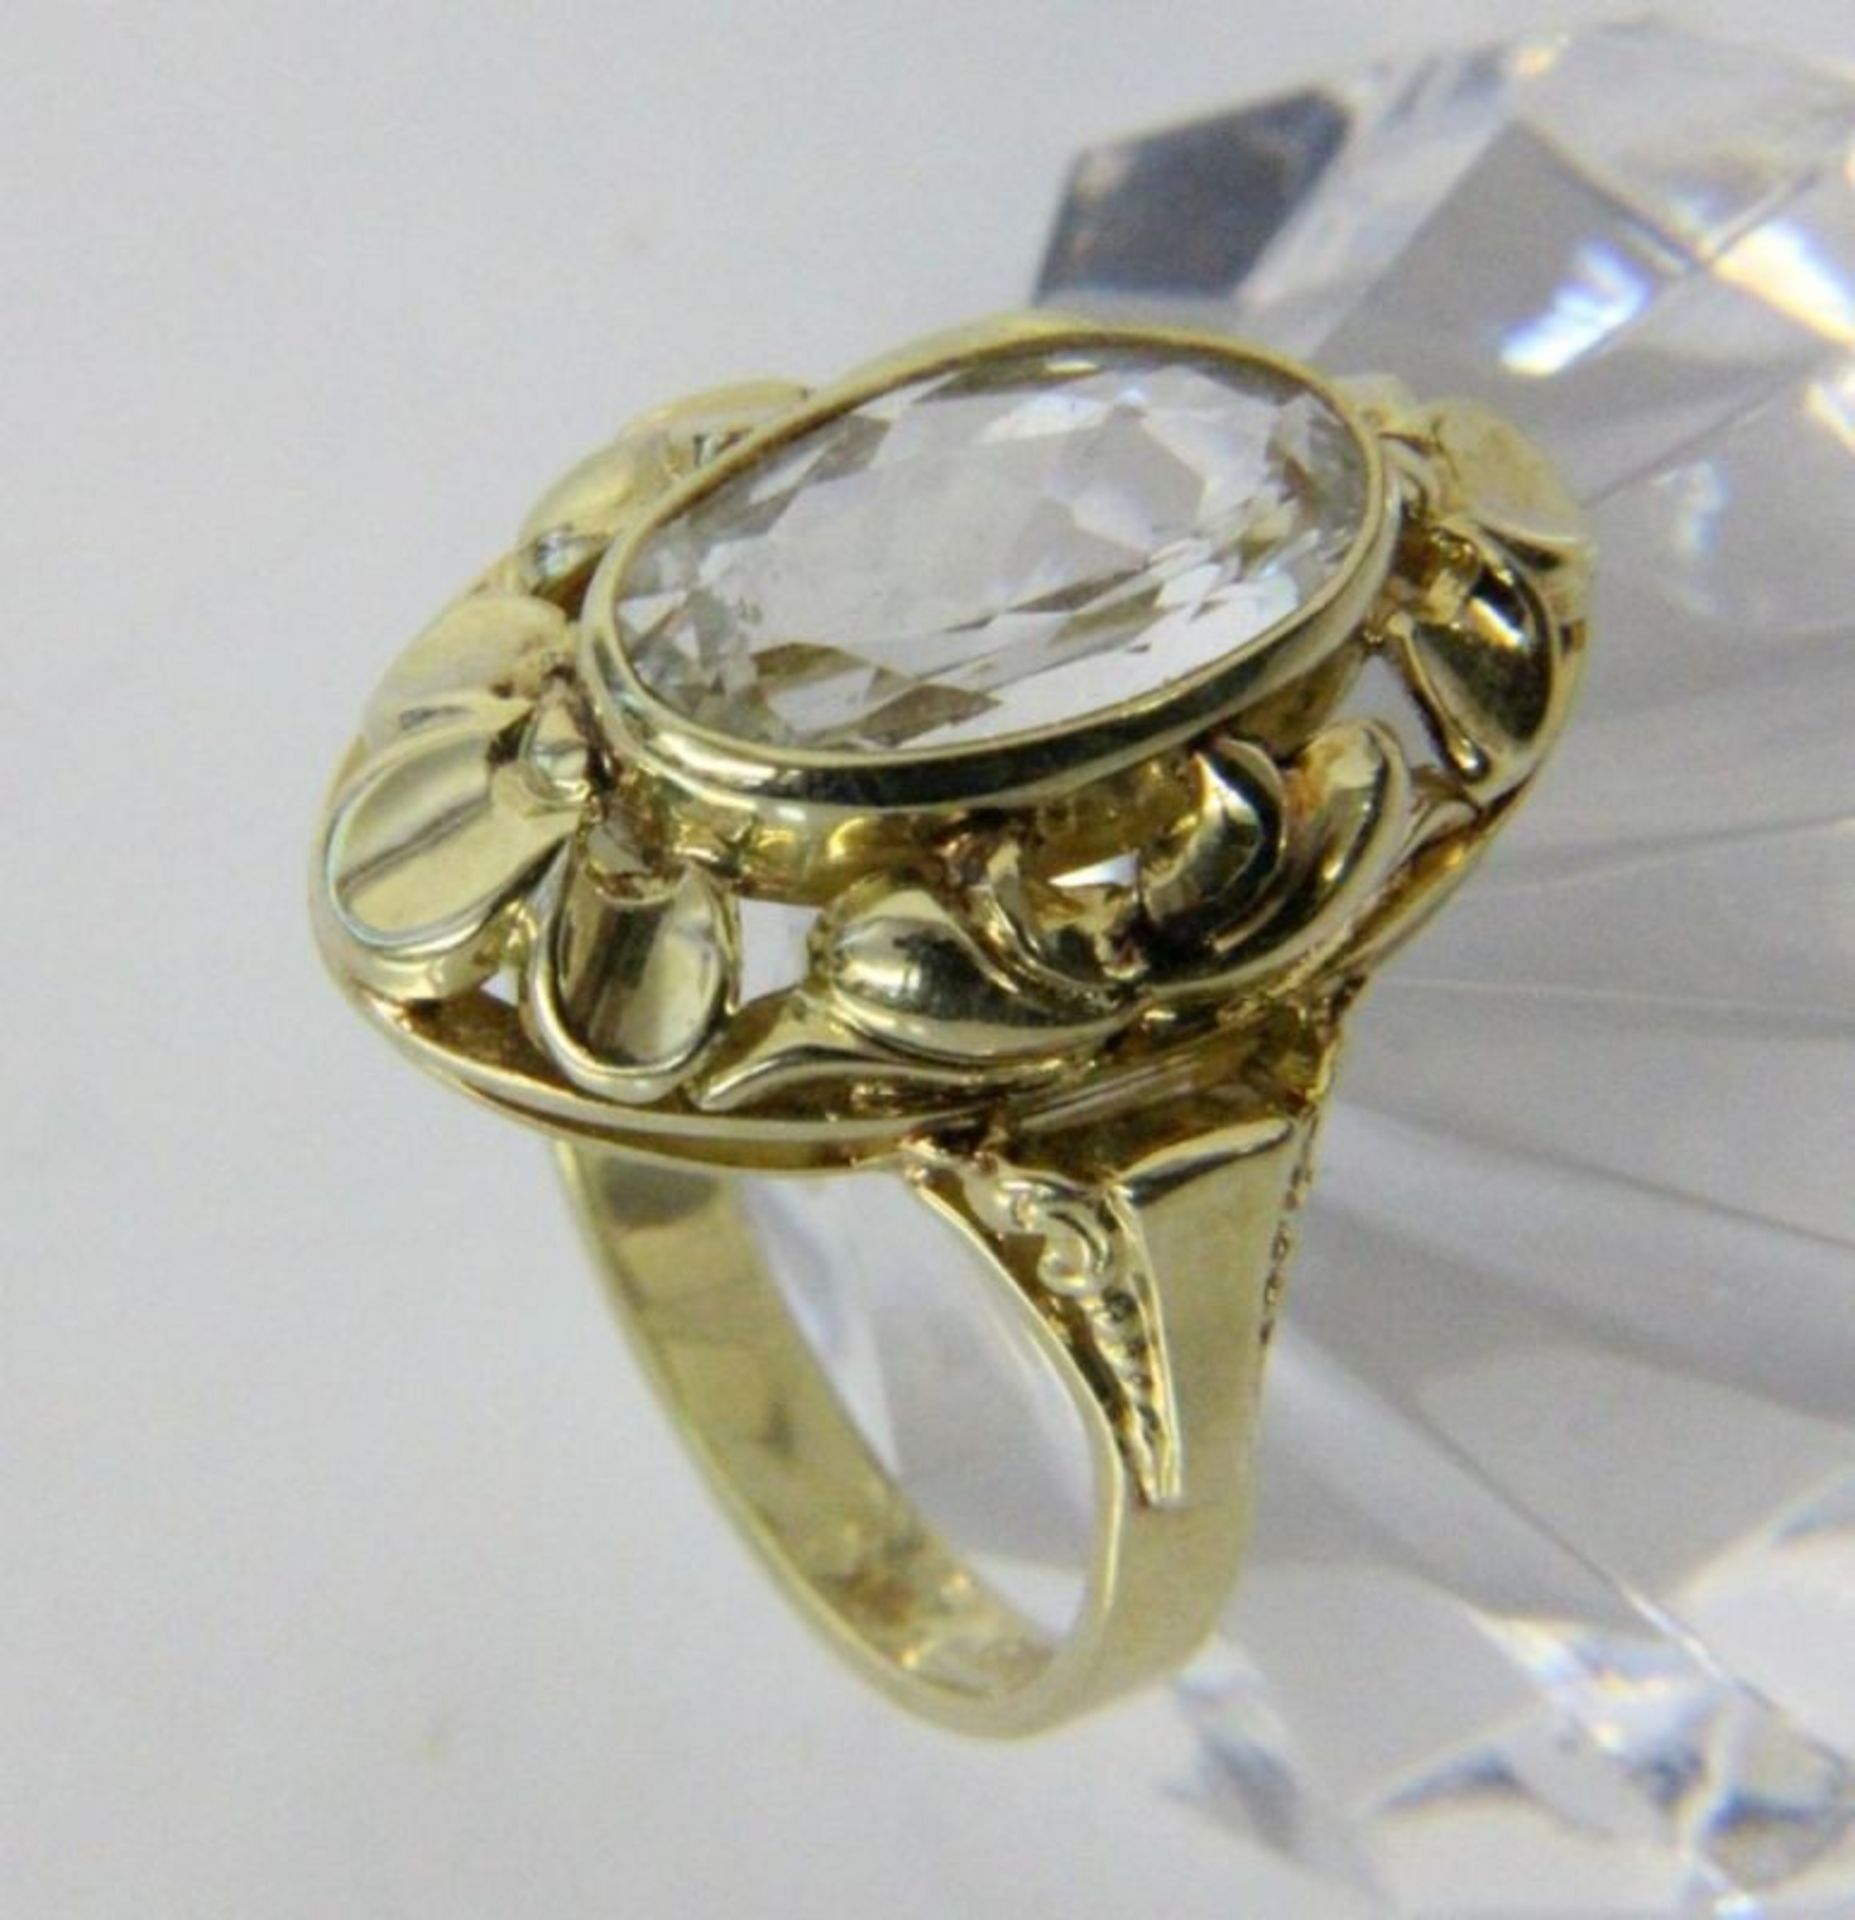 DAMENRING585/000 Gelbgold mit Aquamarin. Ringgr. 55, Brutto ca. 5,2gA LADIES RING 585/000 yellow